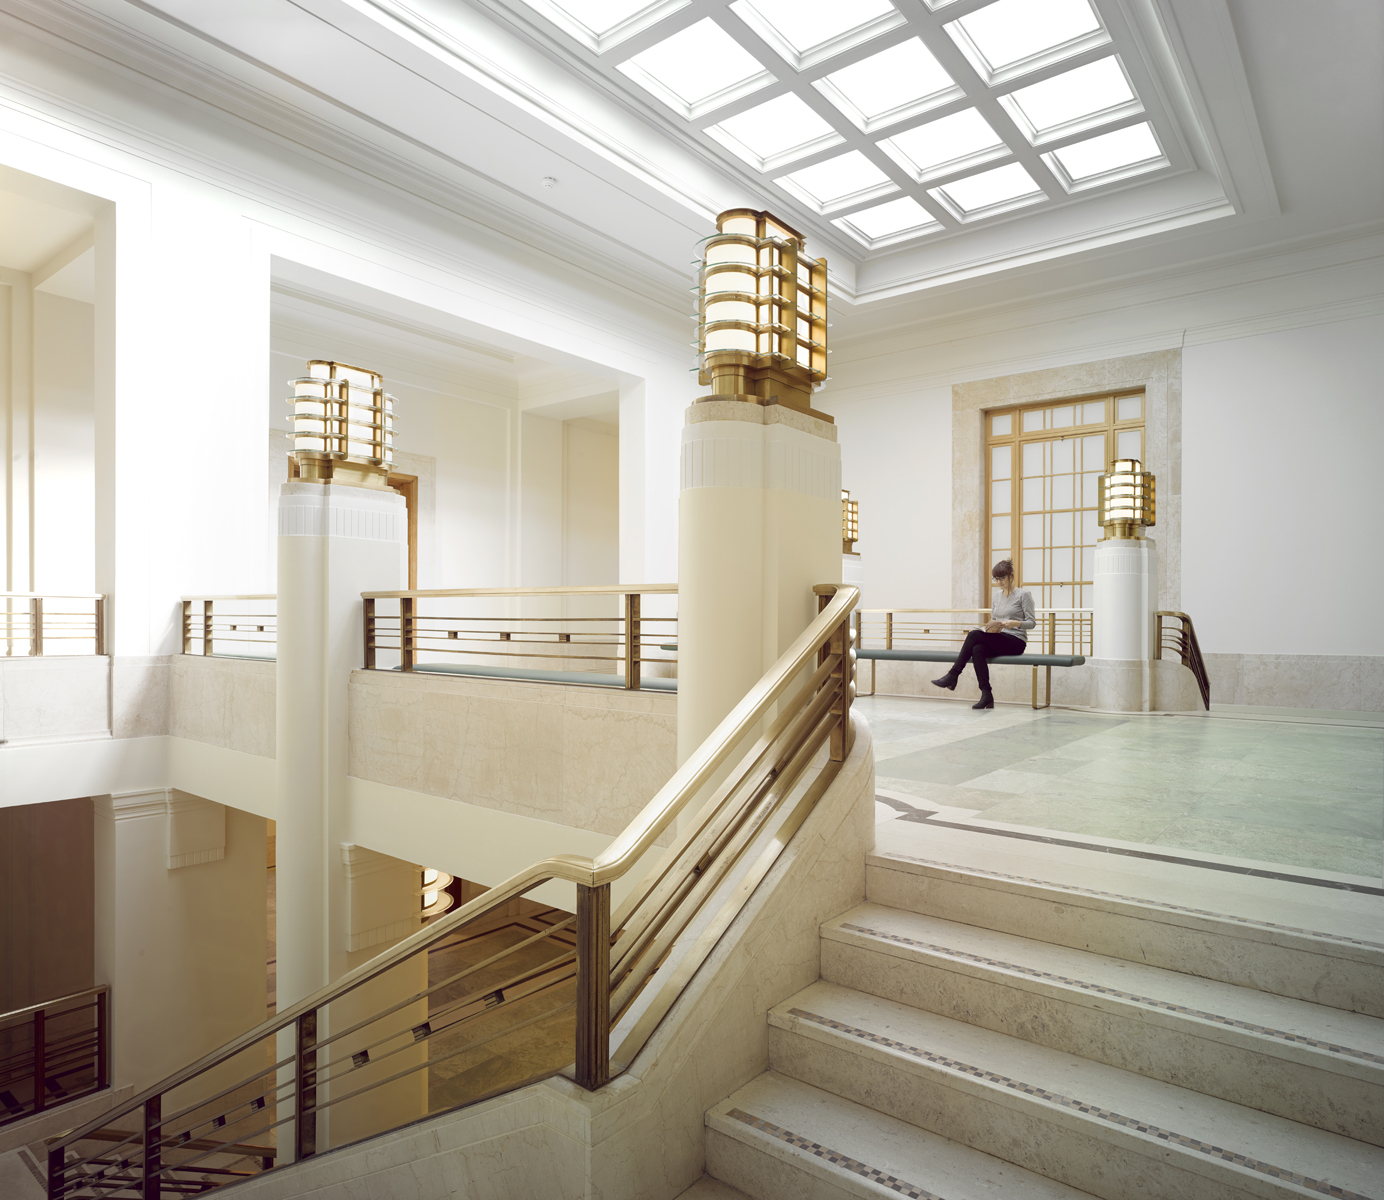 Hackney Town Hall wins NLA Conservation & Retrofit award